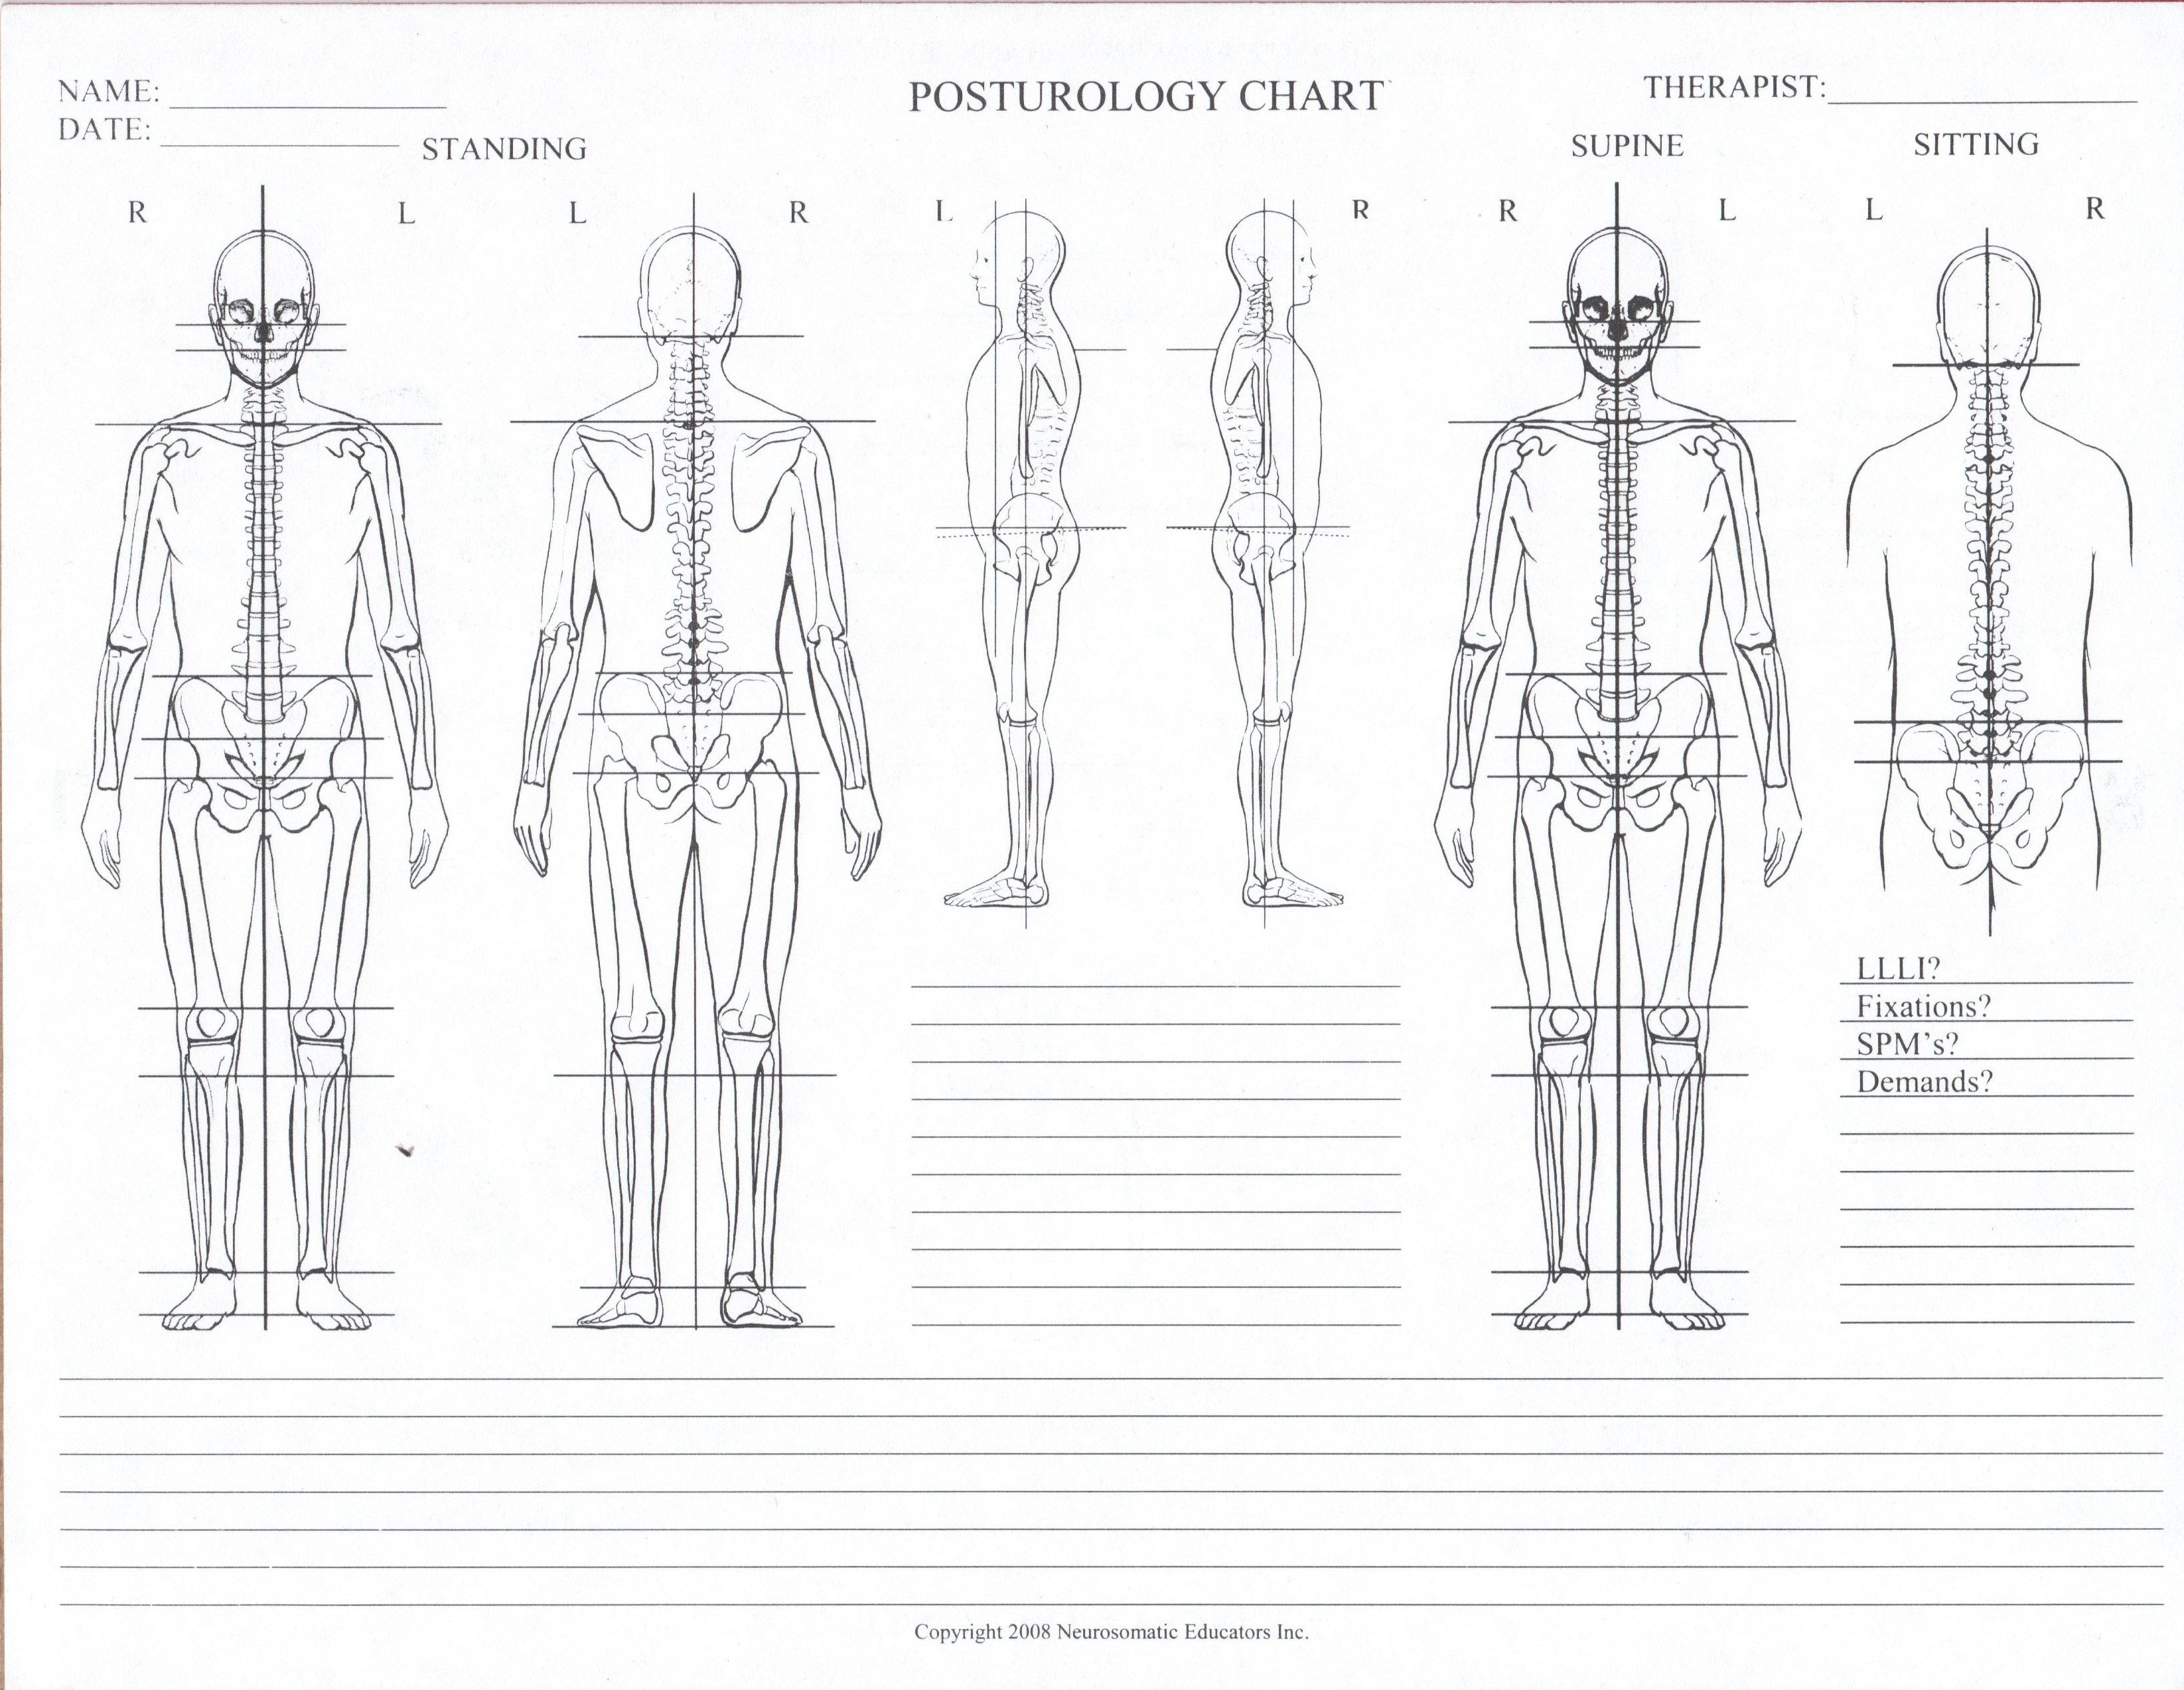 posturology-chart-blank-e1319630941505.jpg 3.291×2.546